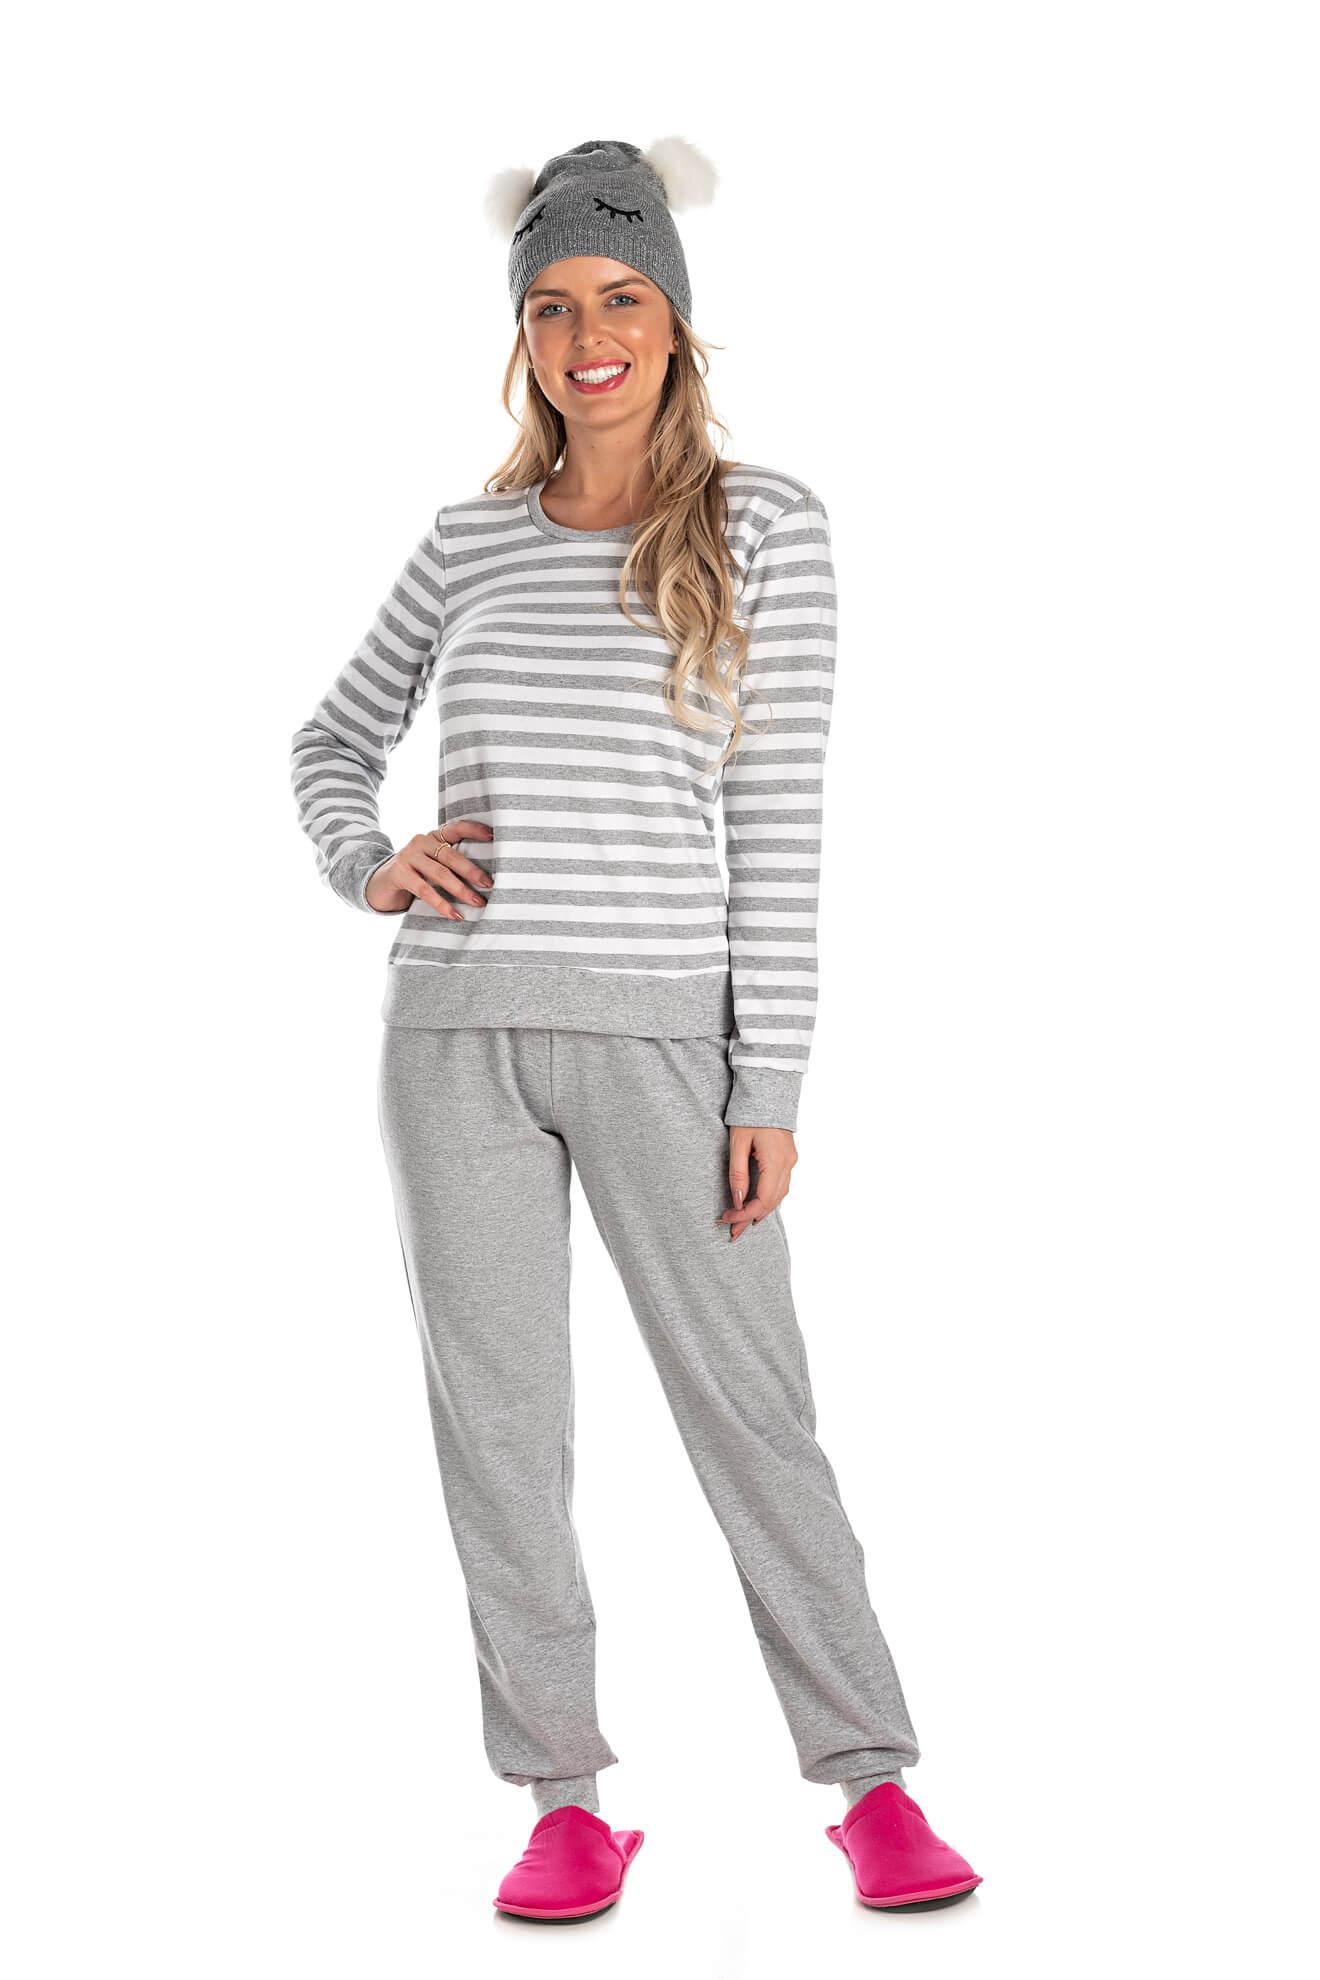 012/A - Pijama Adulto Feminino Listrado